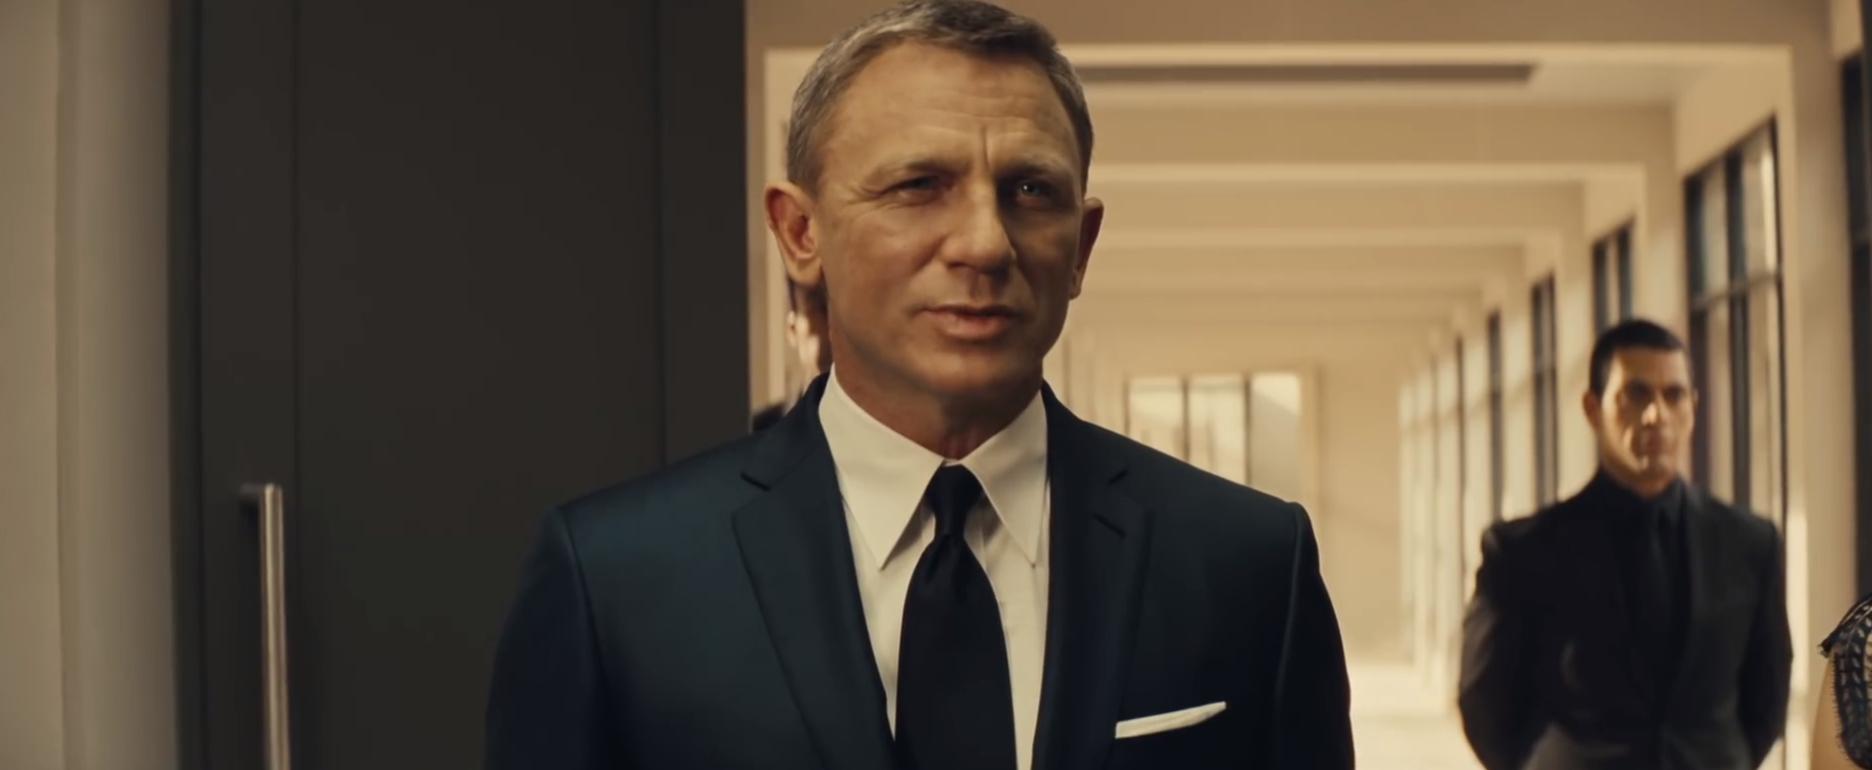 James Bond Im Tv